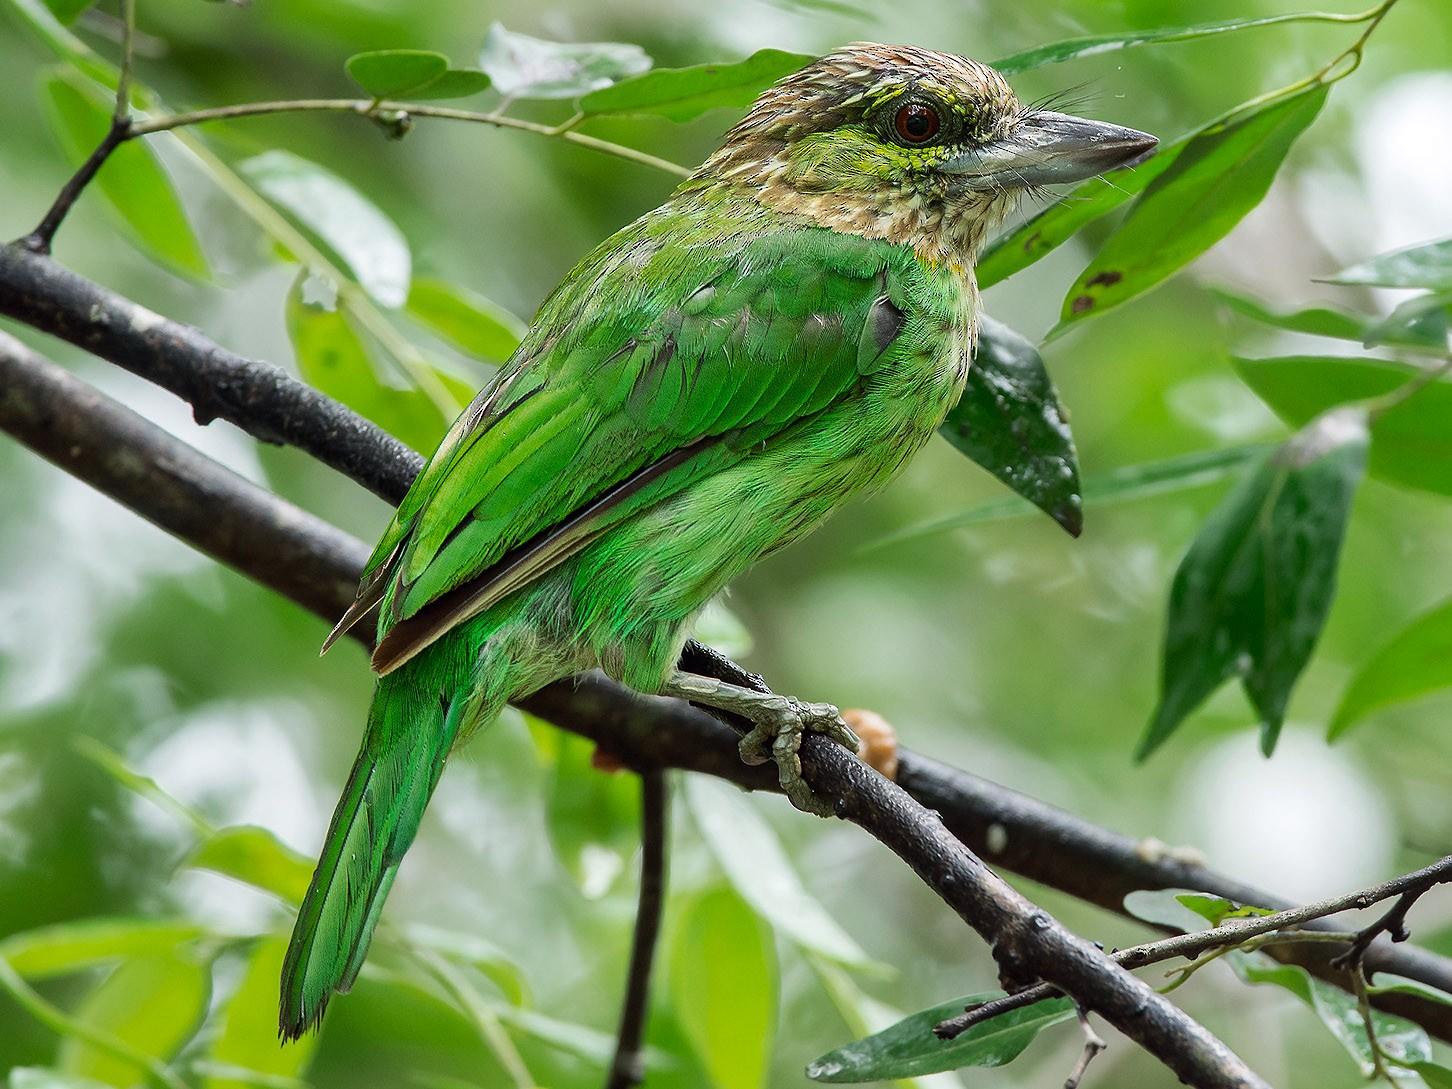 Green-eared Barbet - Natthaphat Chotjuckdikul